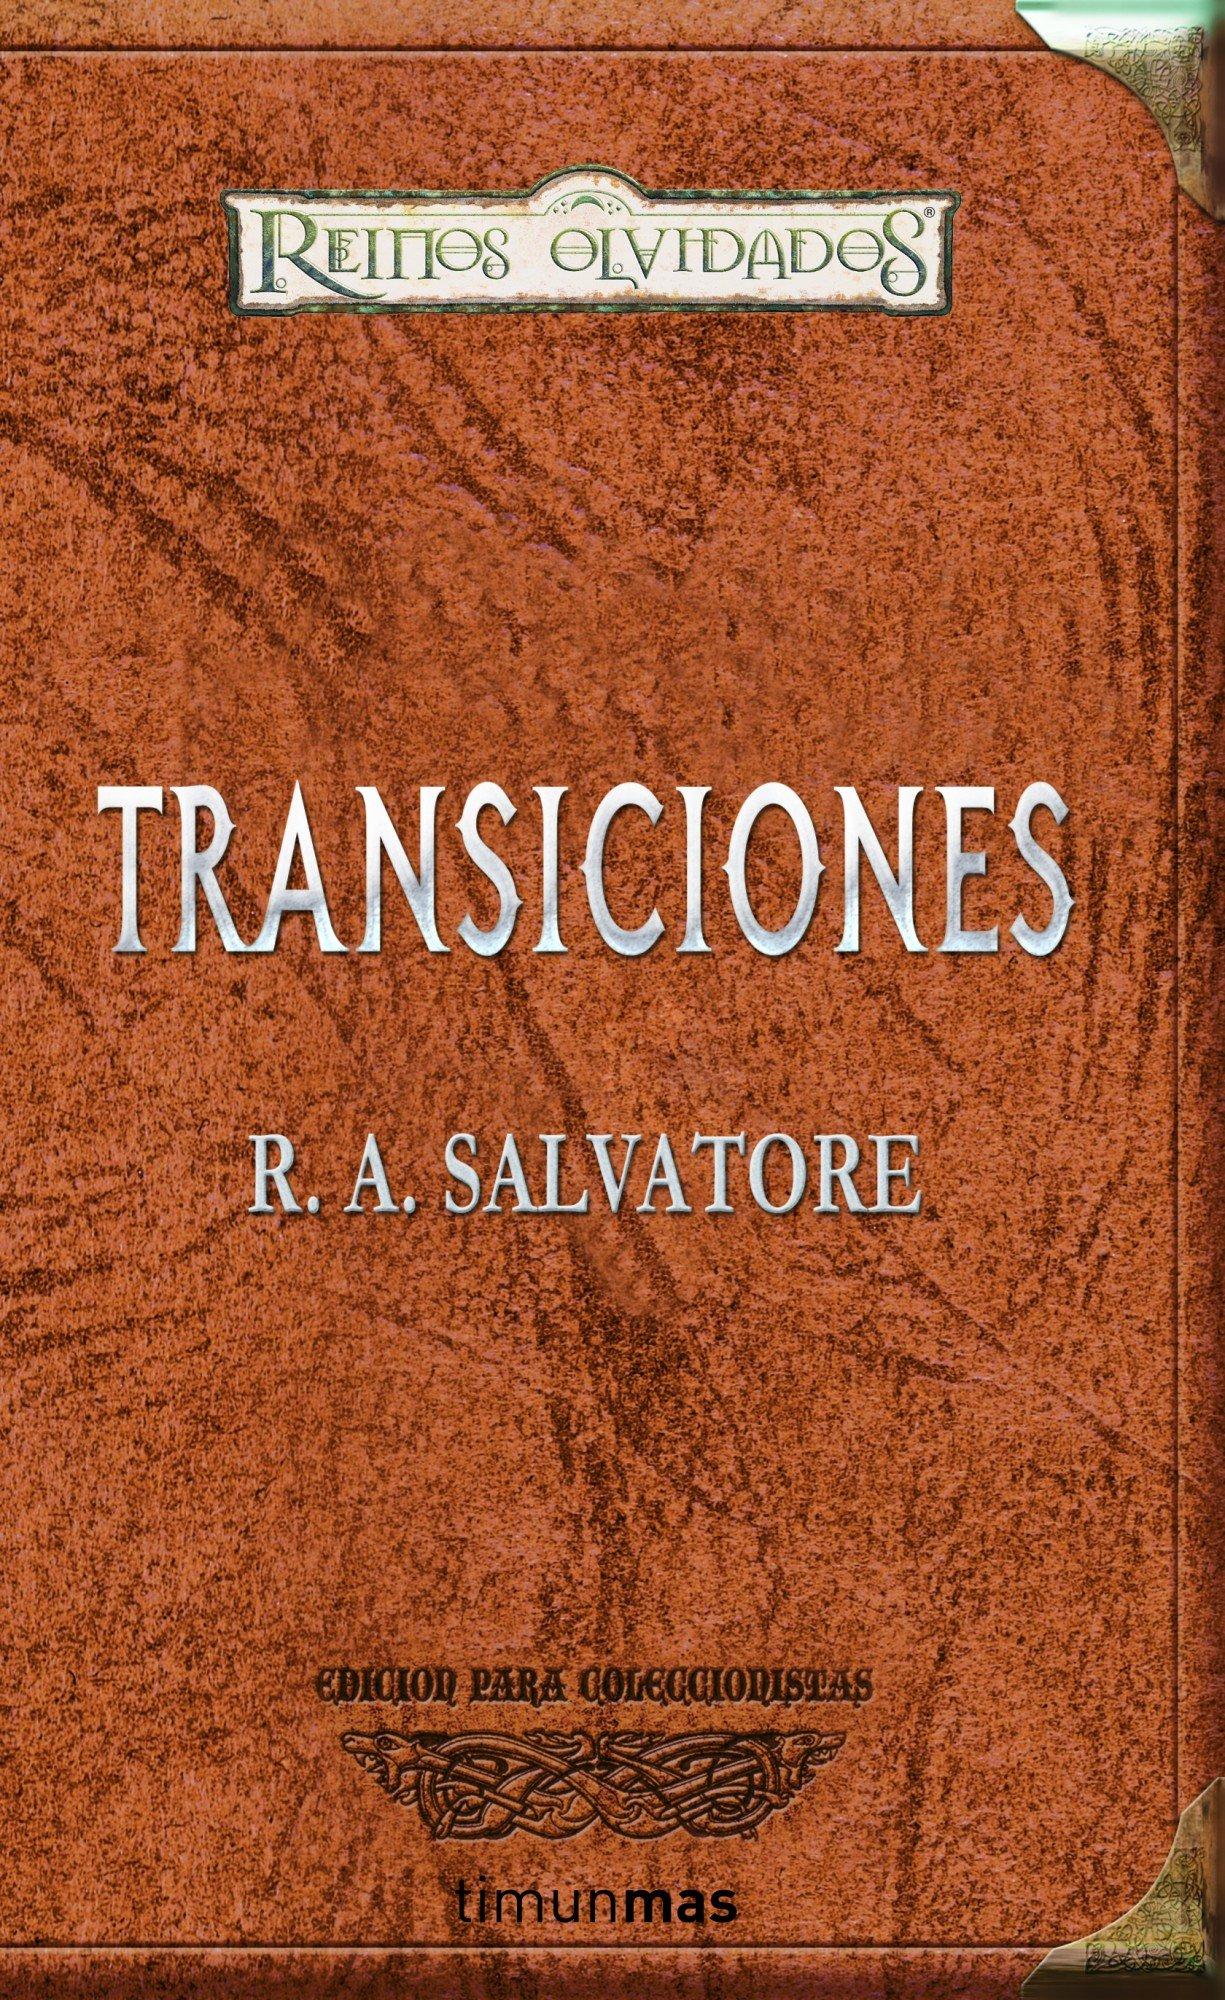 Coleccionista Transiciones (Reinos Olvidados) Tapa dura – 2 sep 2011 R. A. Salvatore Emma Fondevila Timun Mas Narrativa 844803872X